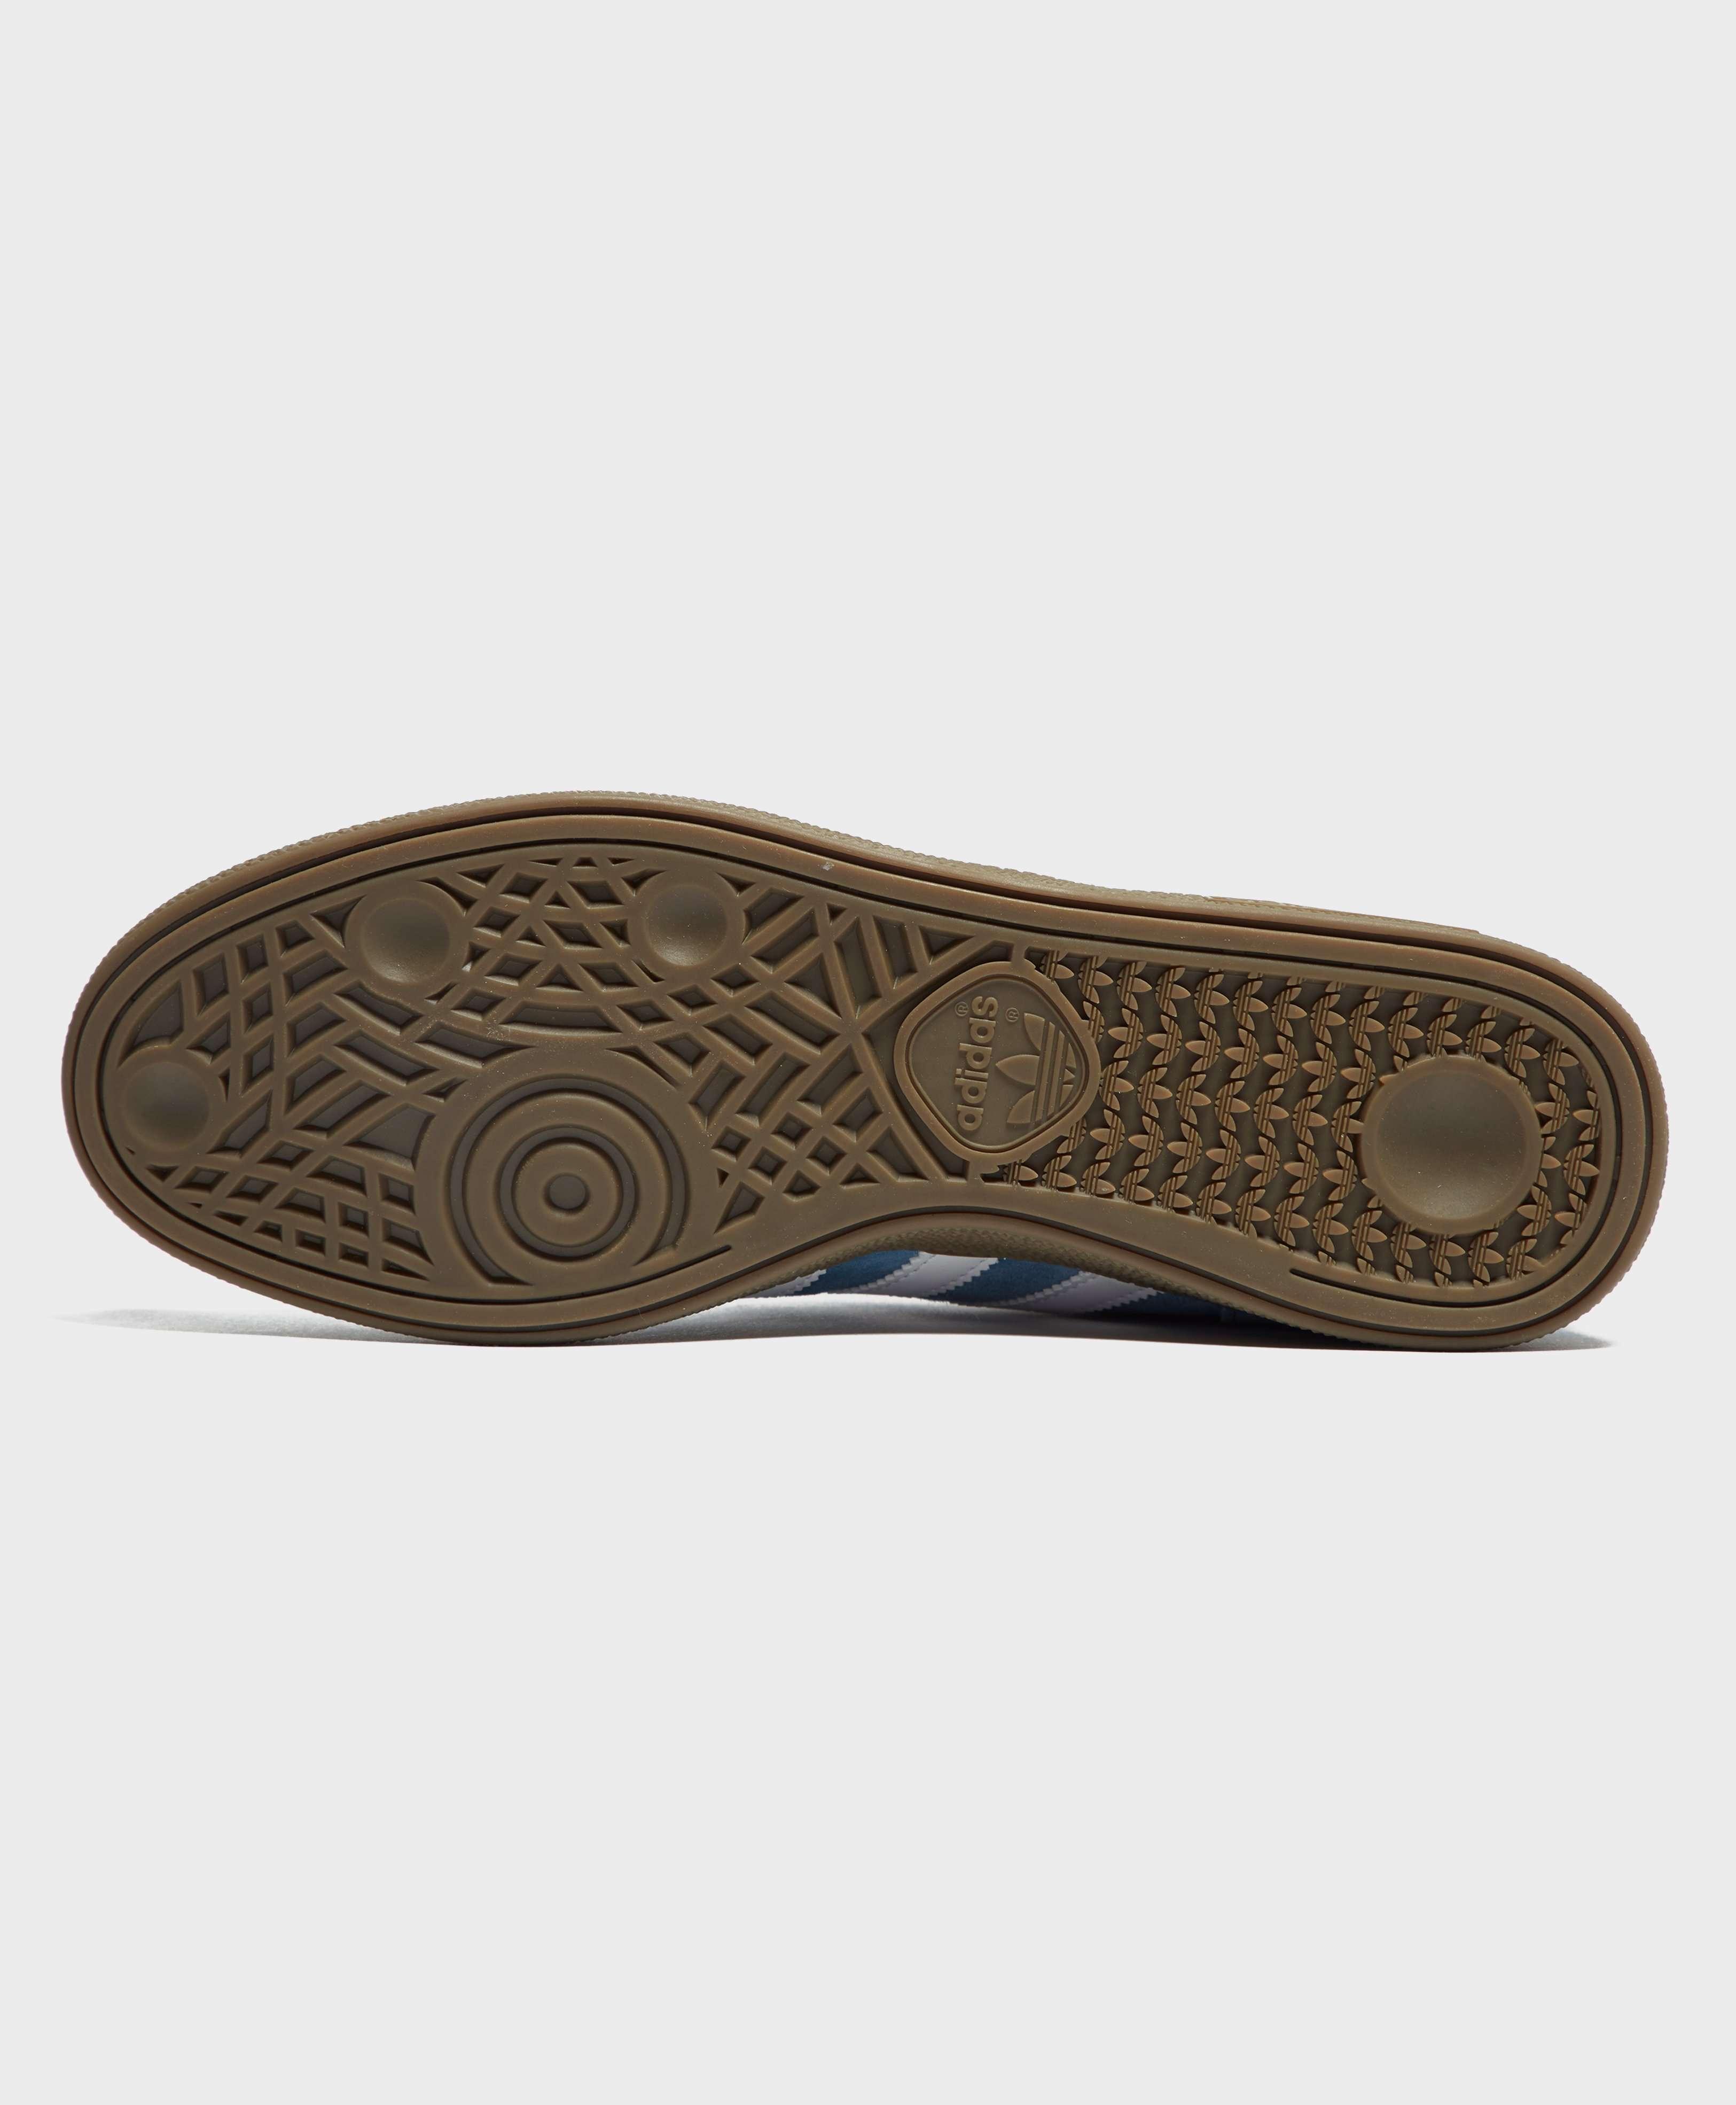 Adidas Originals Spezial Scotts hombre wear